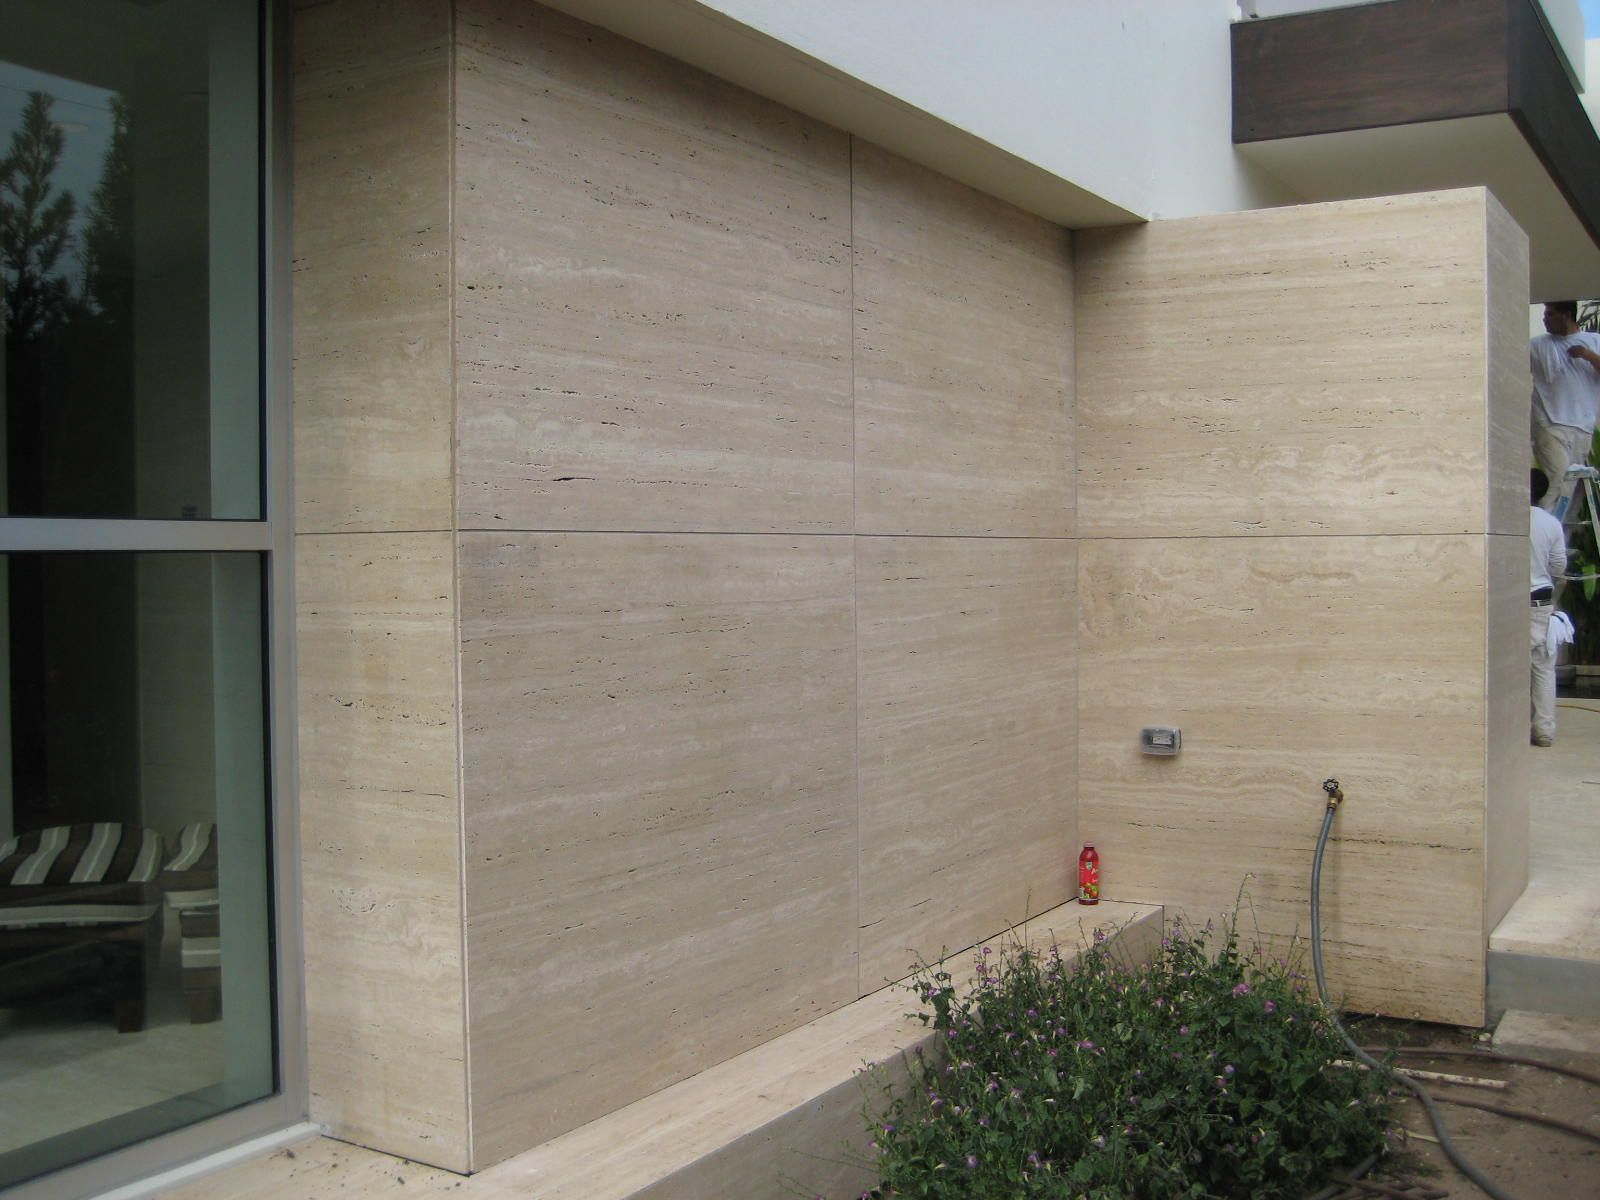 Wooden Wall Tiles Design For Outside House